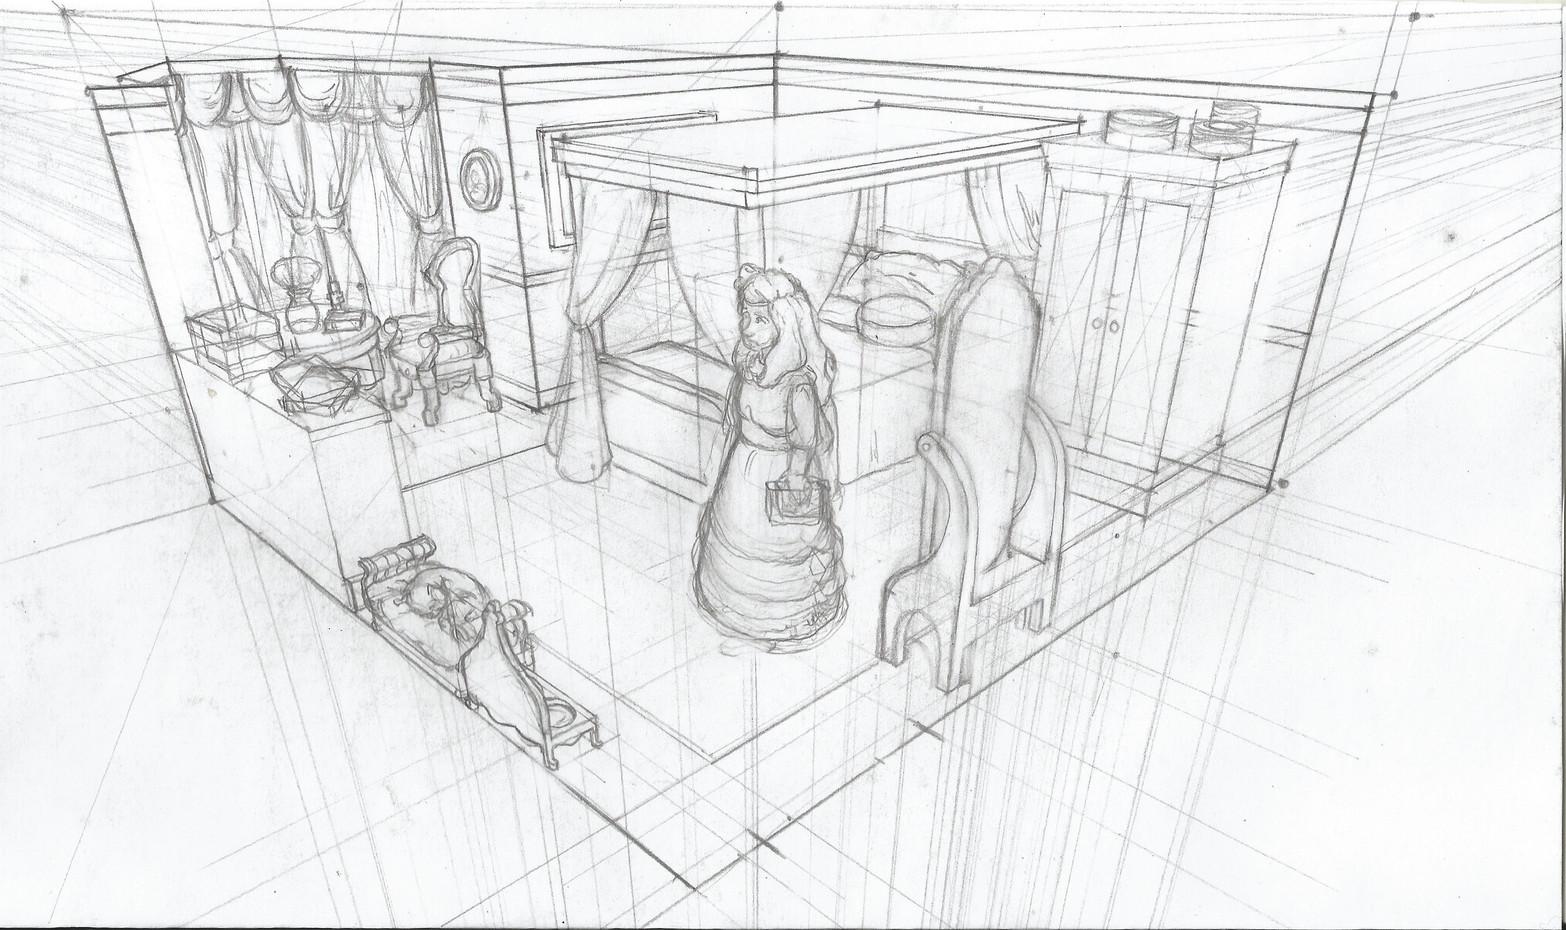 Dorthy Room Sketch